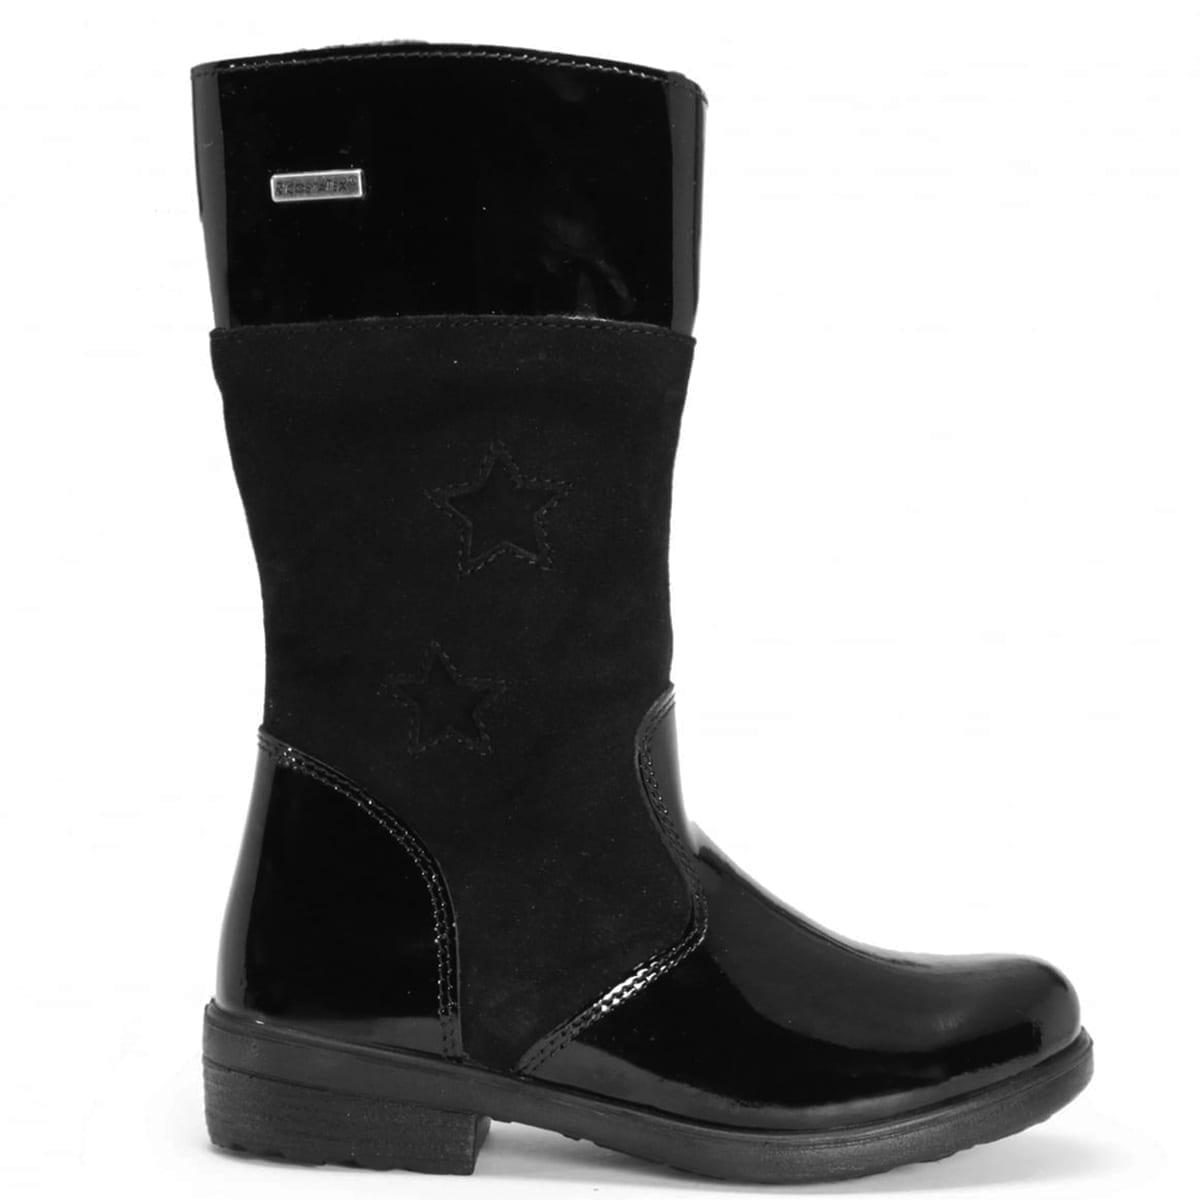 Ricosta Hannah Black Boots - Stomp